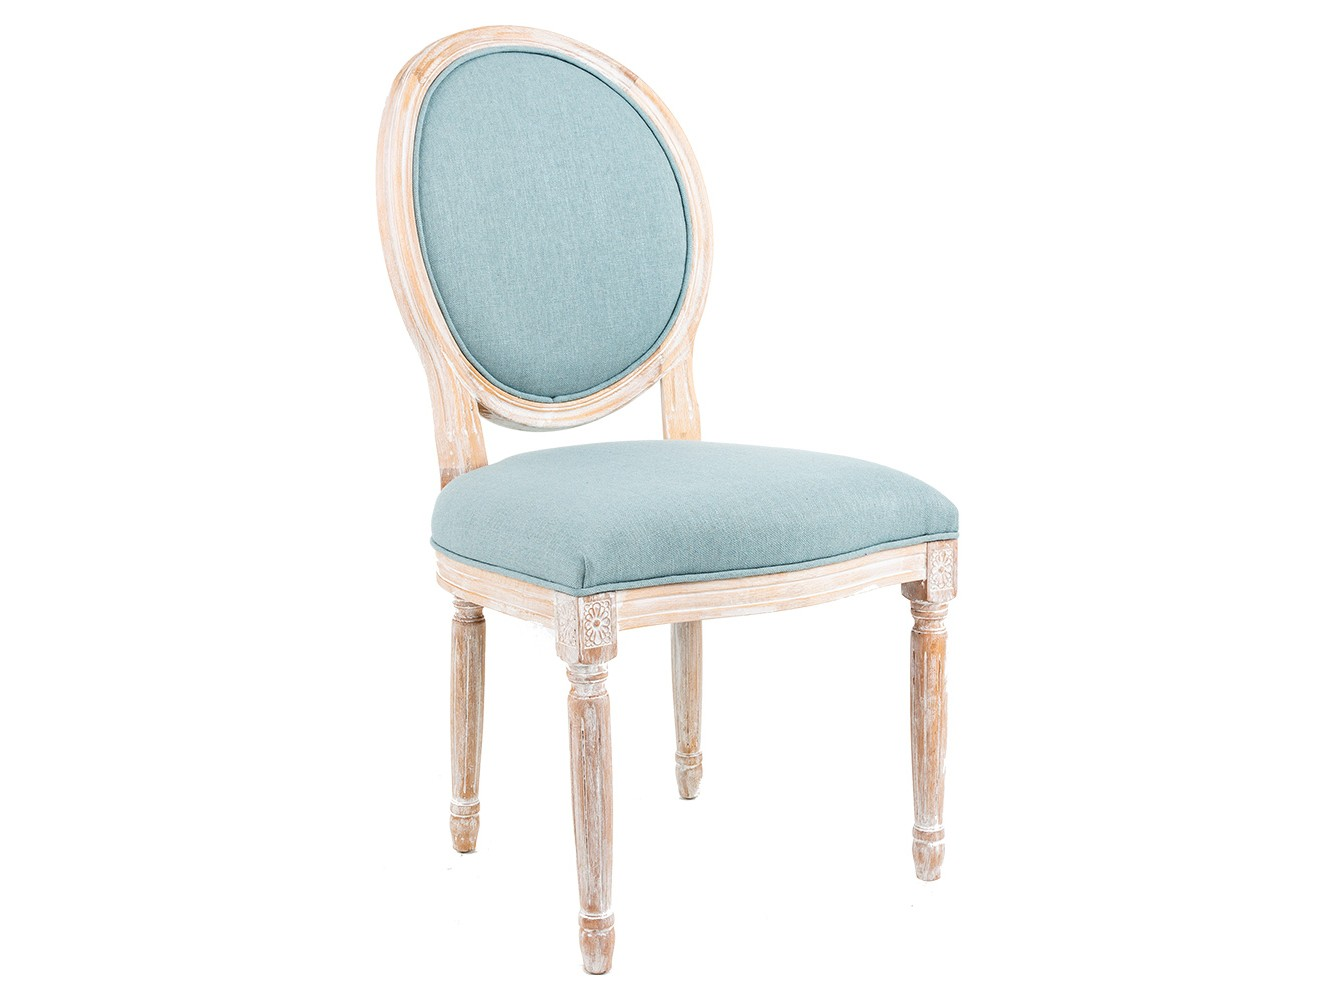 Кухонный стул Object Desire 15438290 от thefurnish